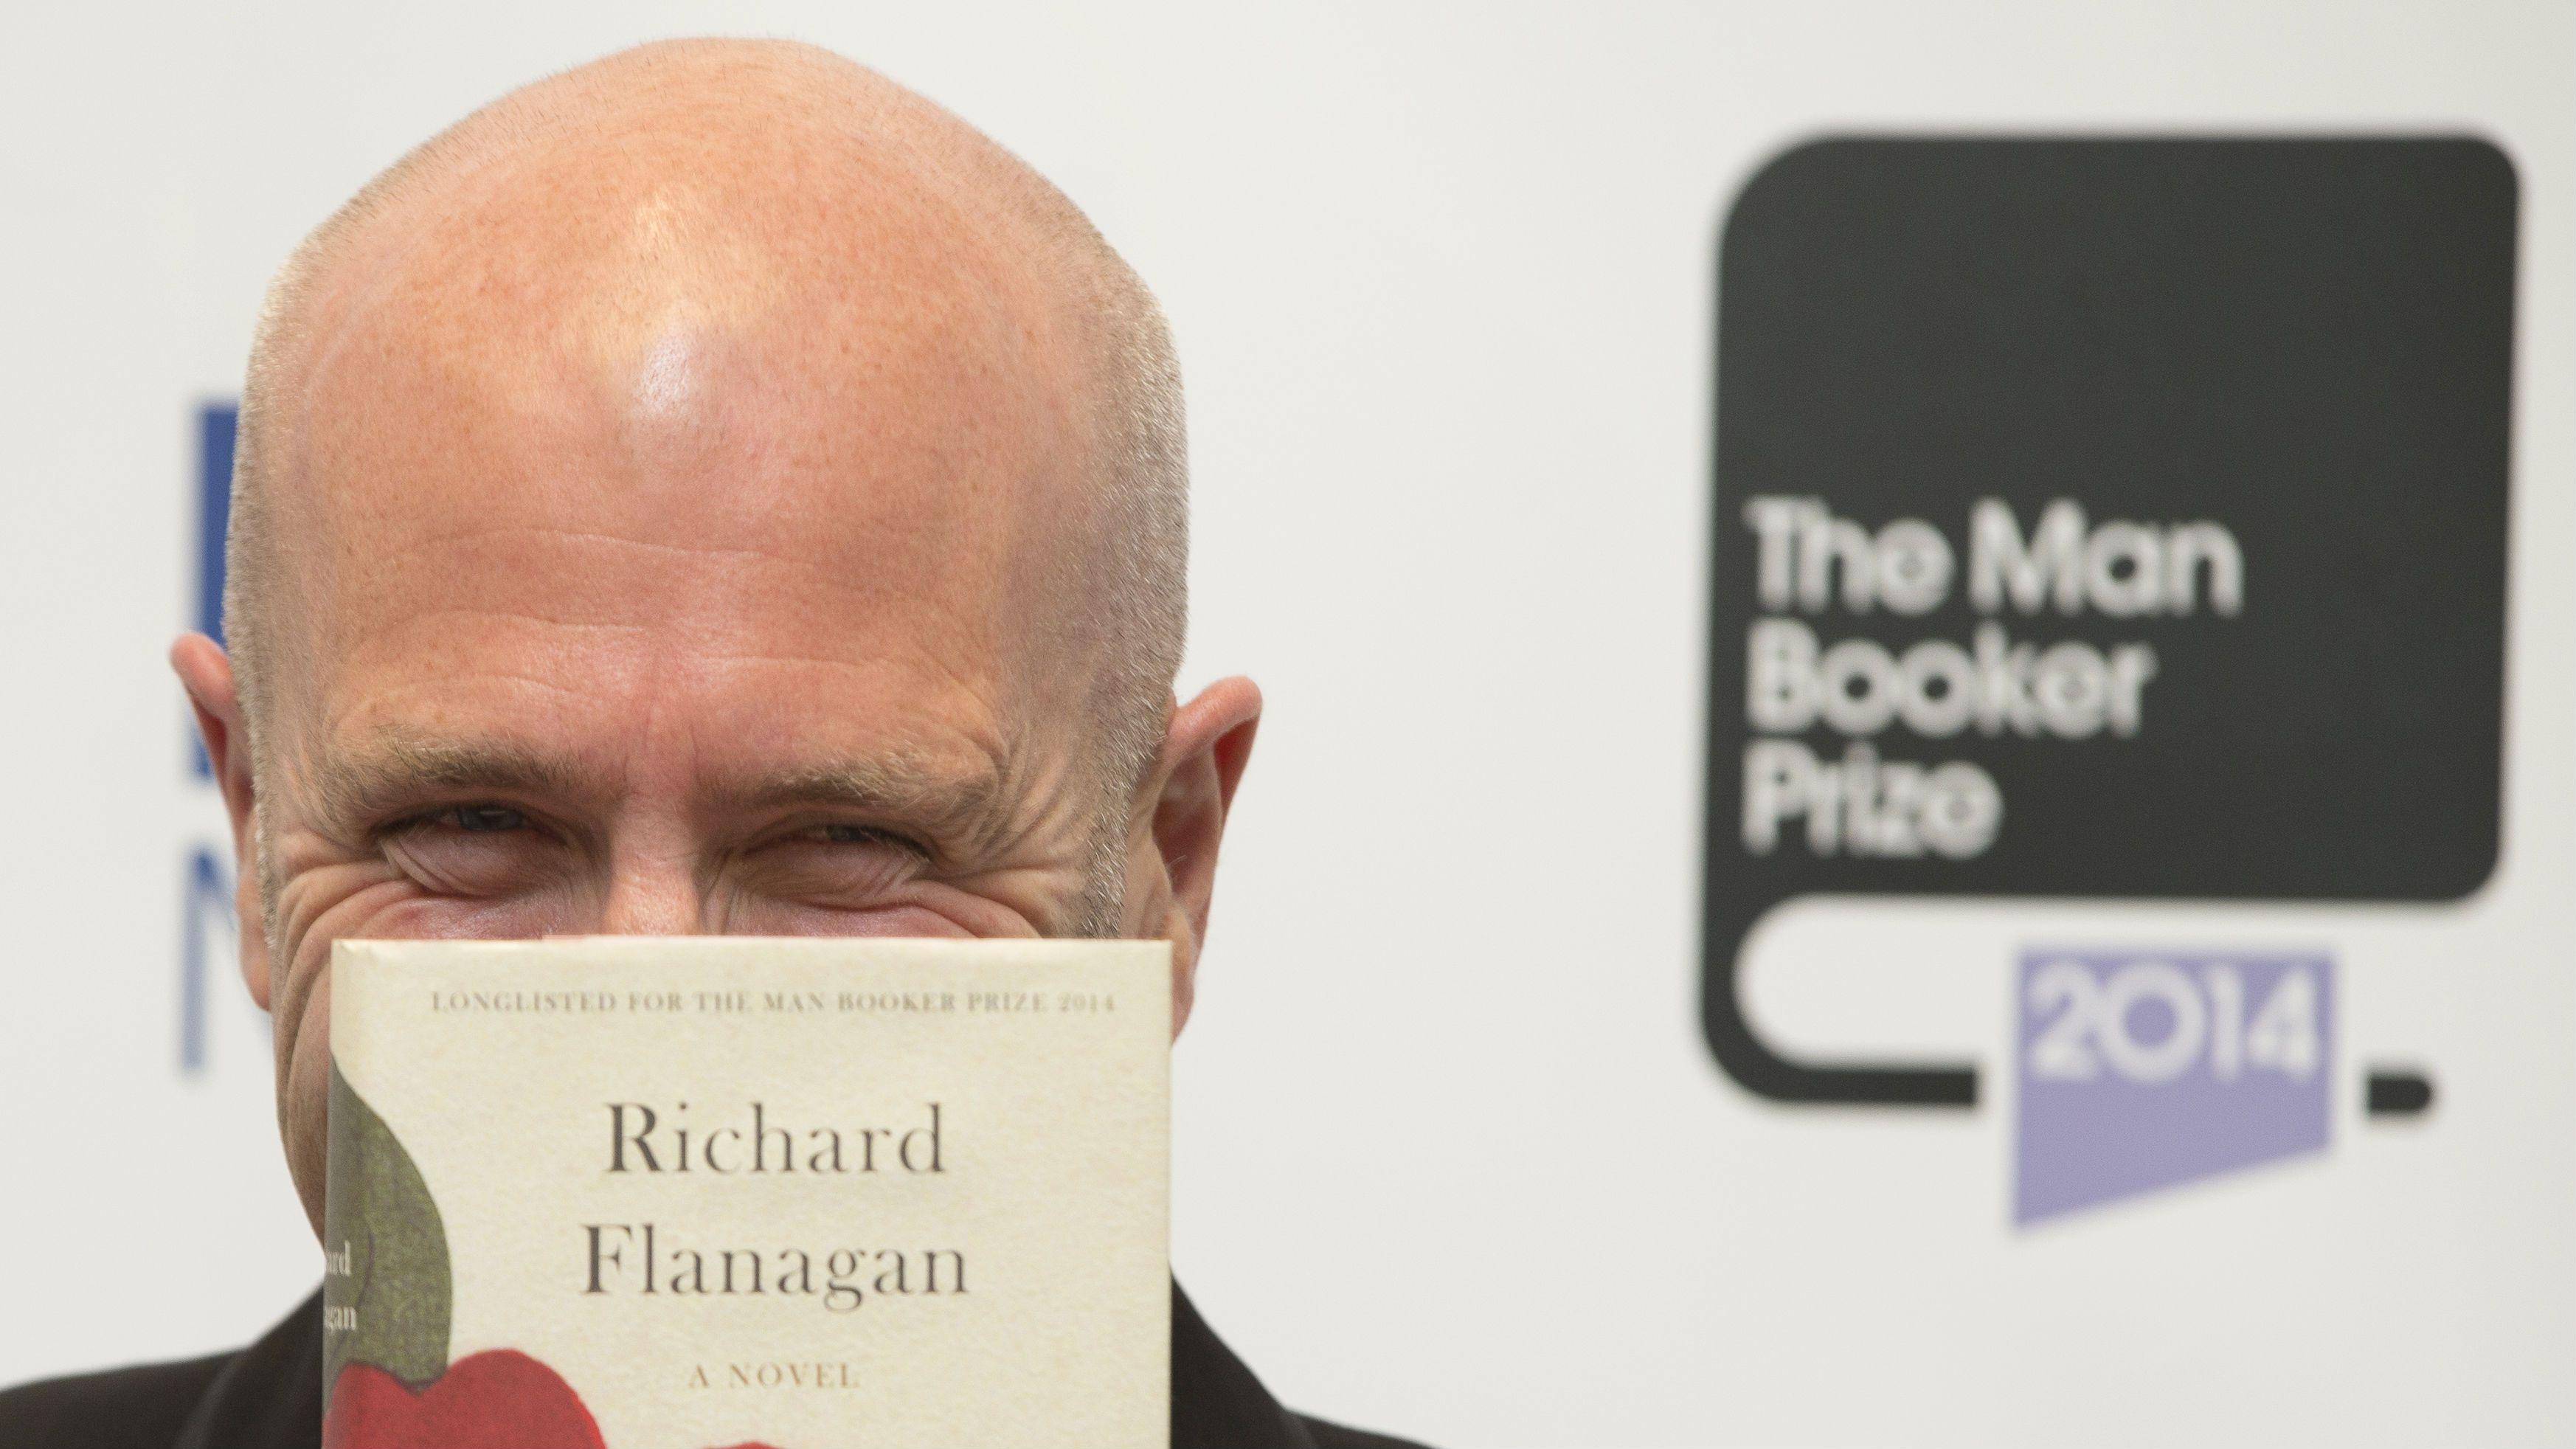 Richard Flanagan Man Booker